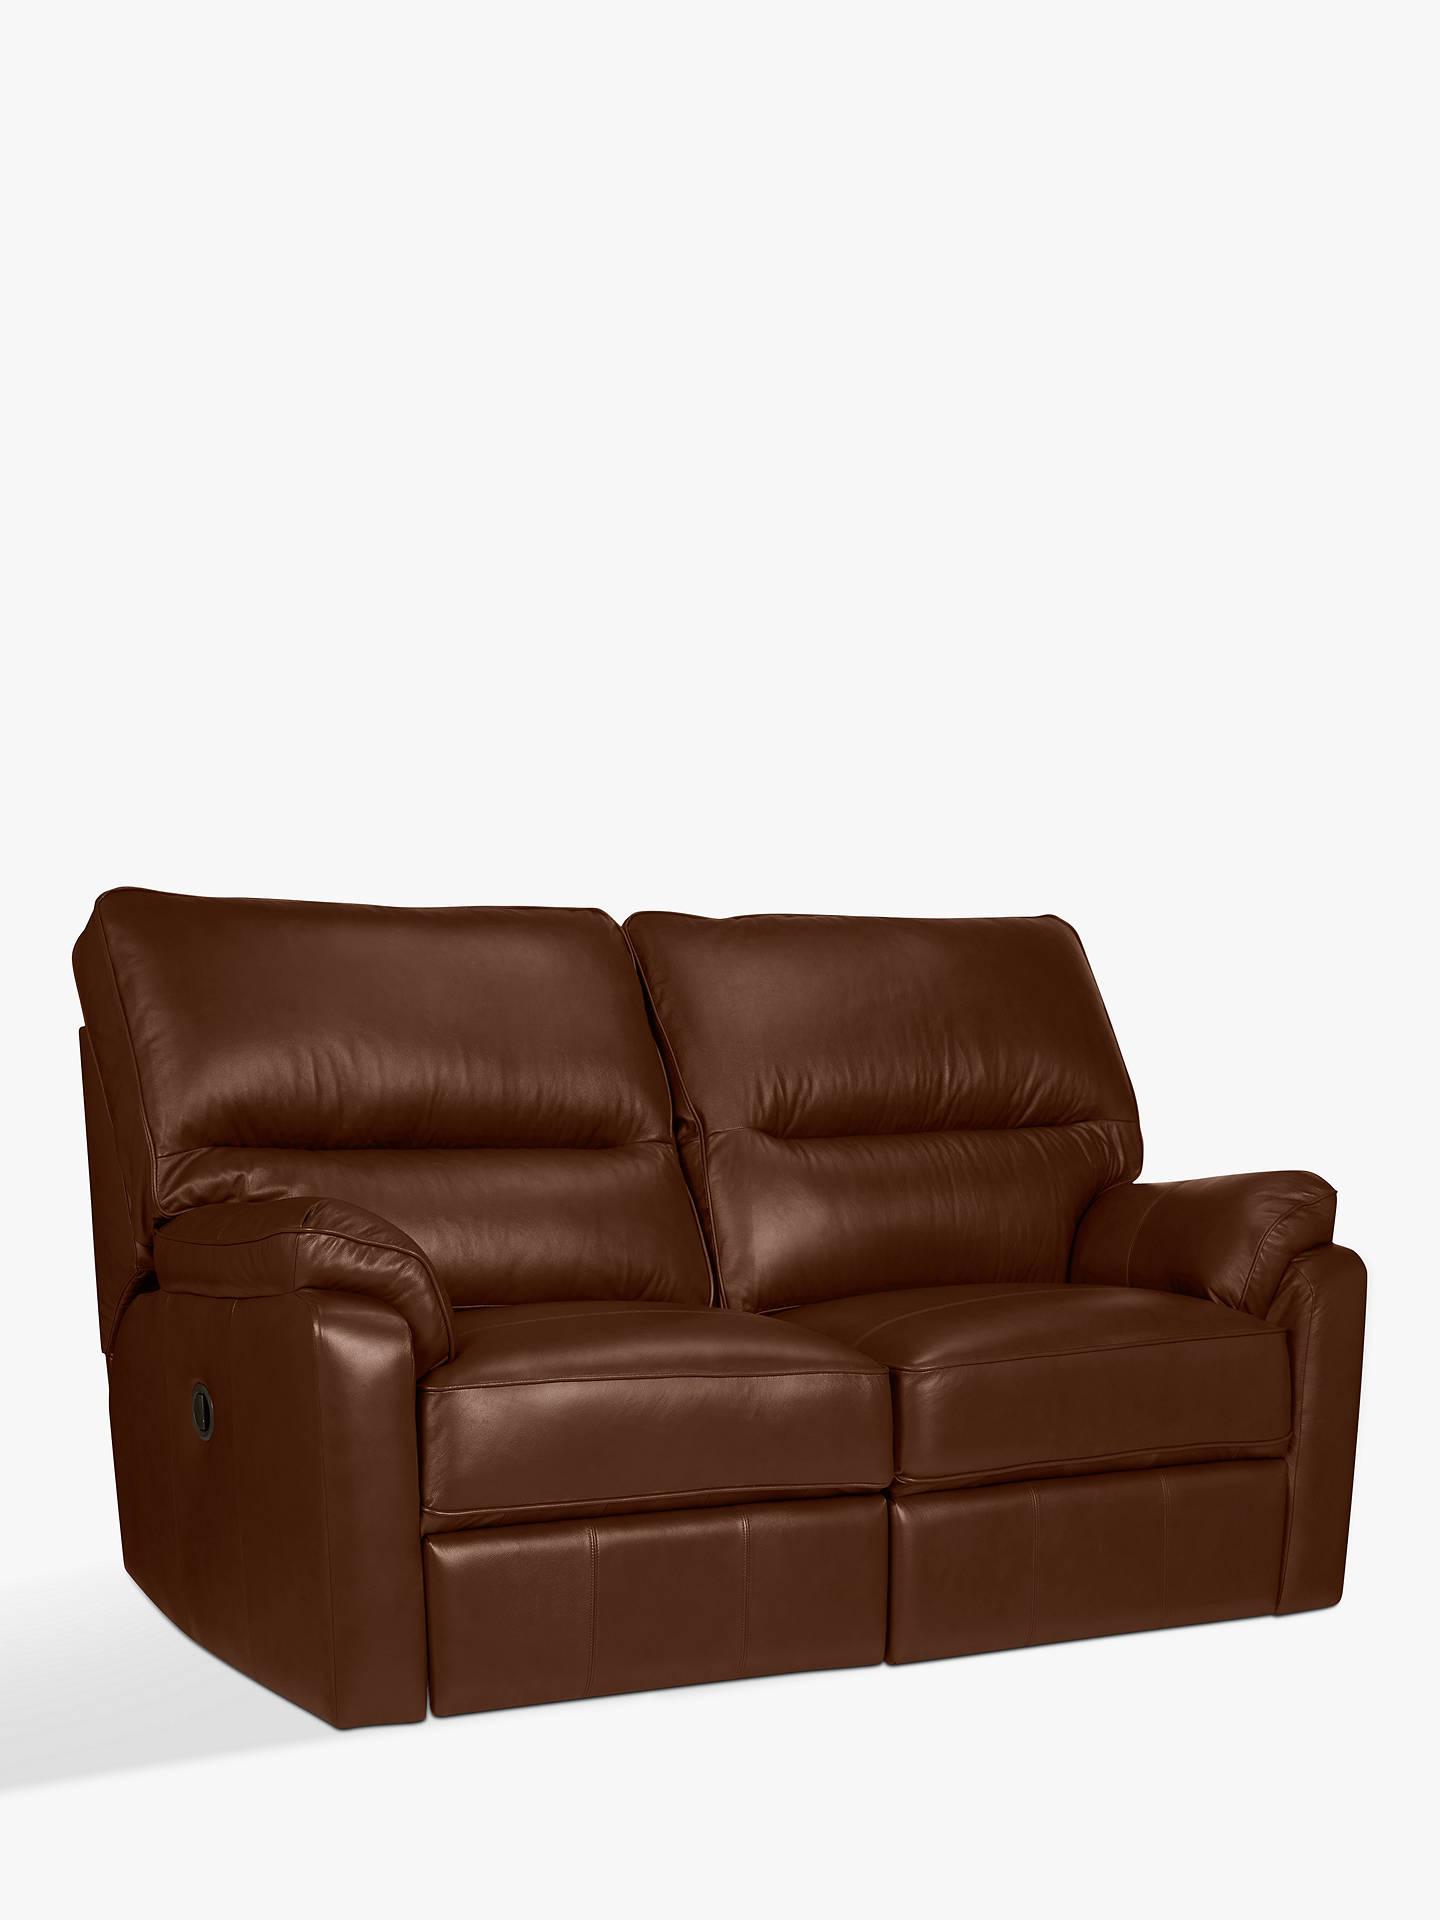 John Lewis Partners Carlisle Small 2 Seater Power Recliner Leather Sofa Dark Leg Milan Chestnut